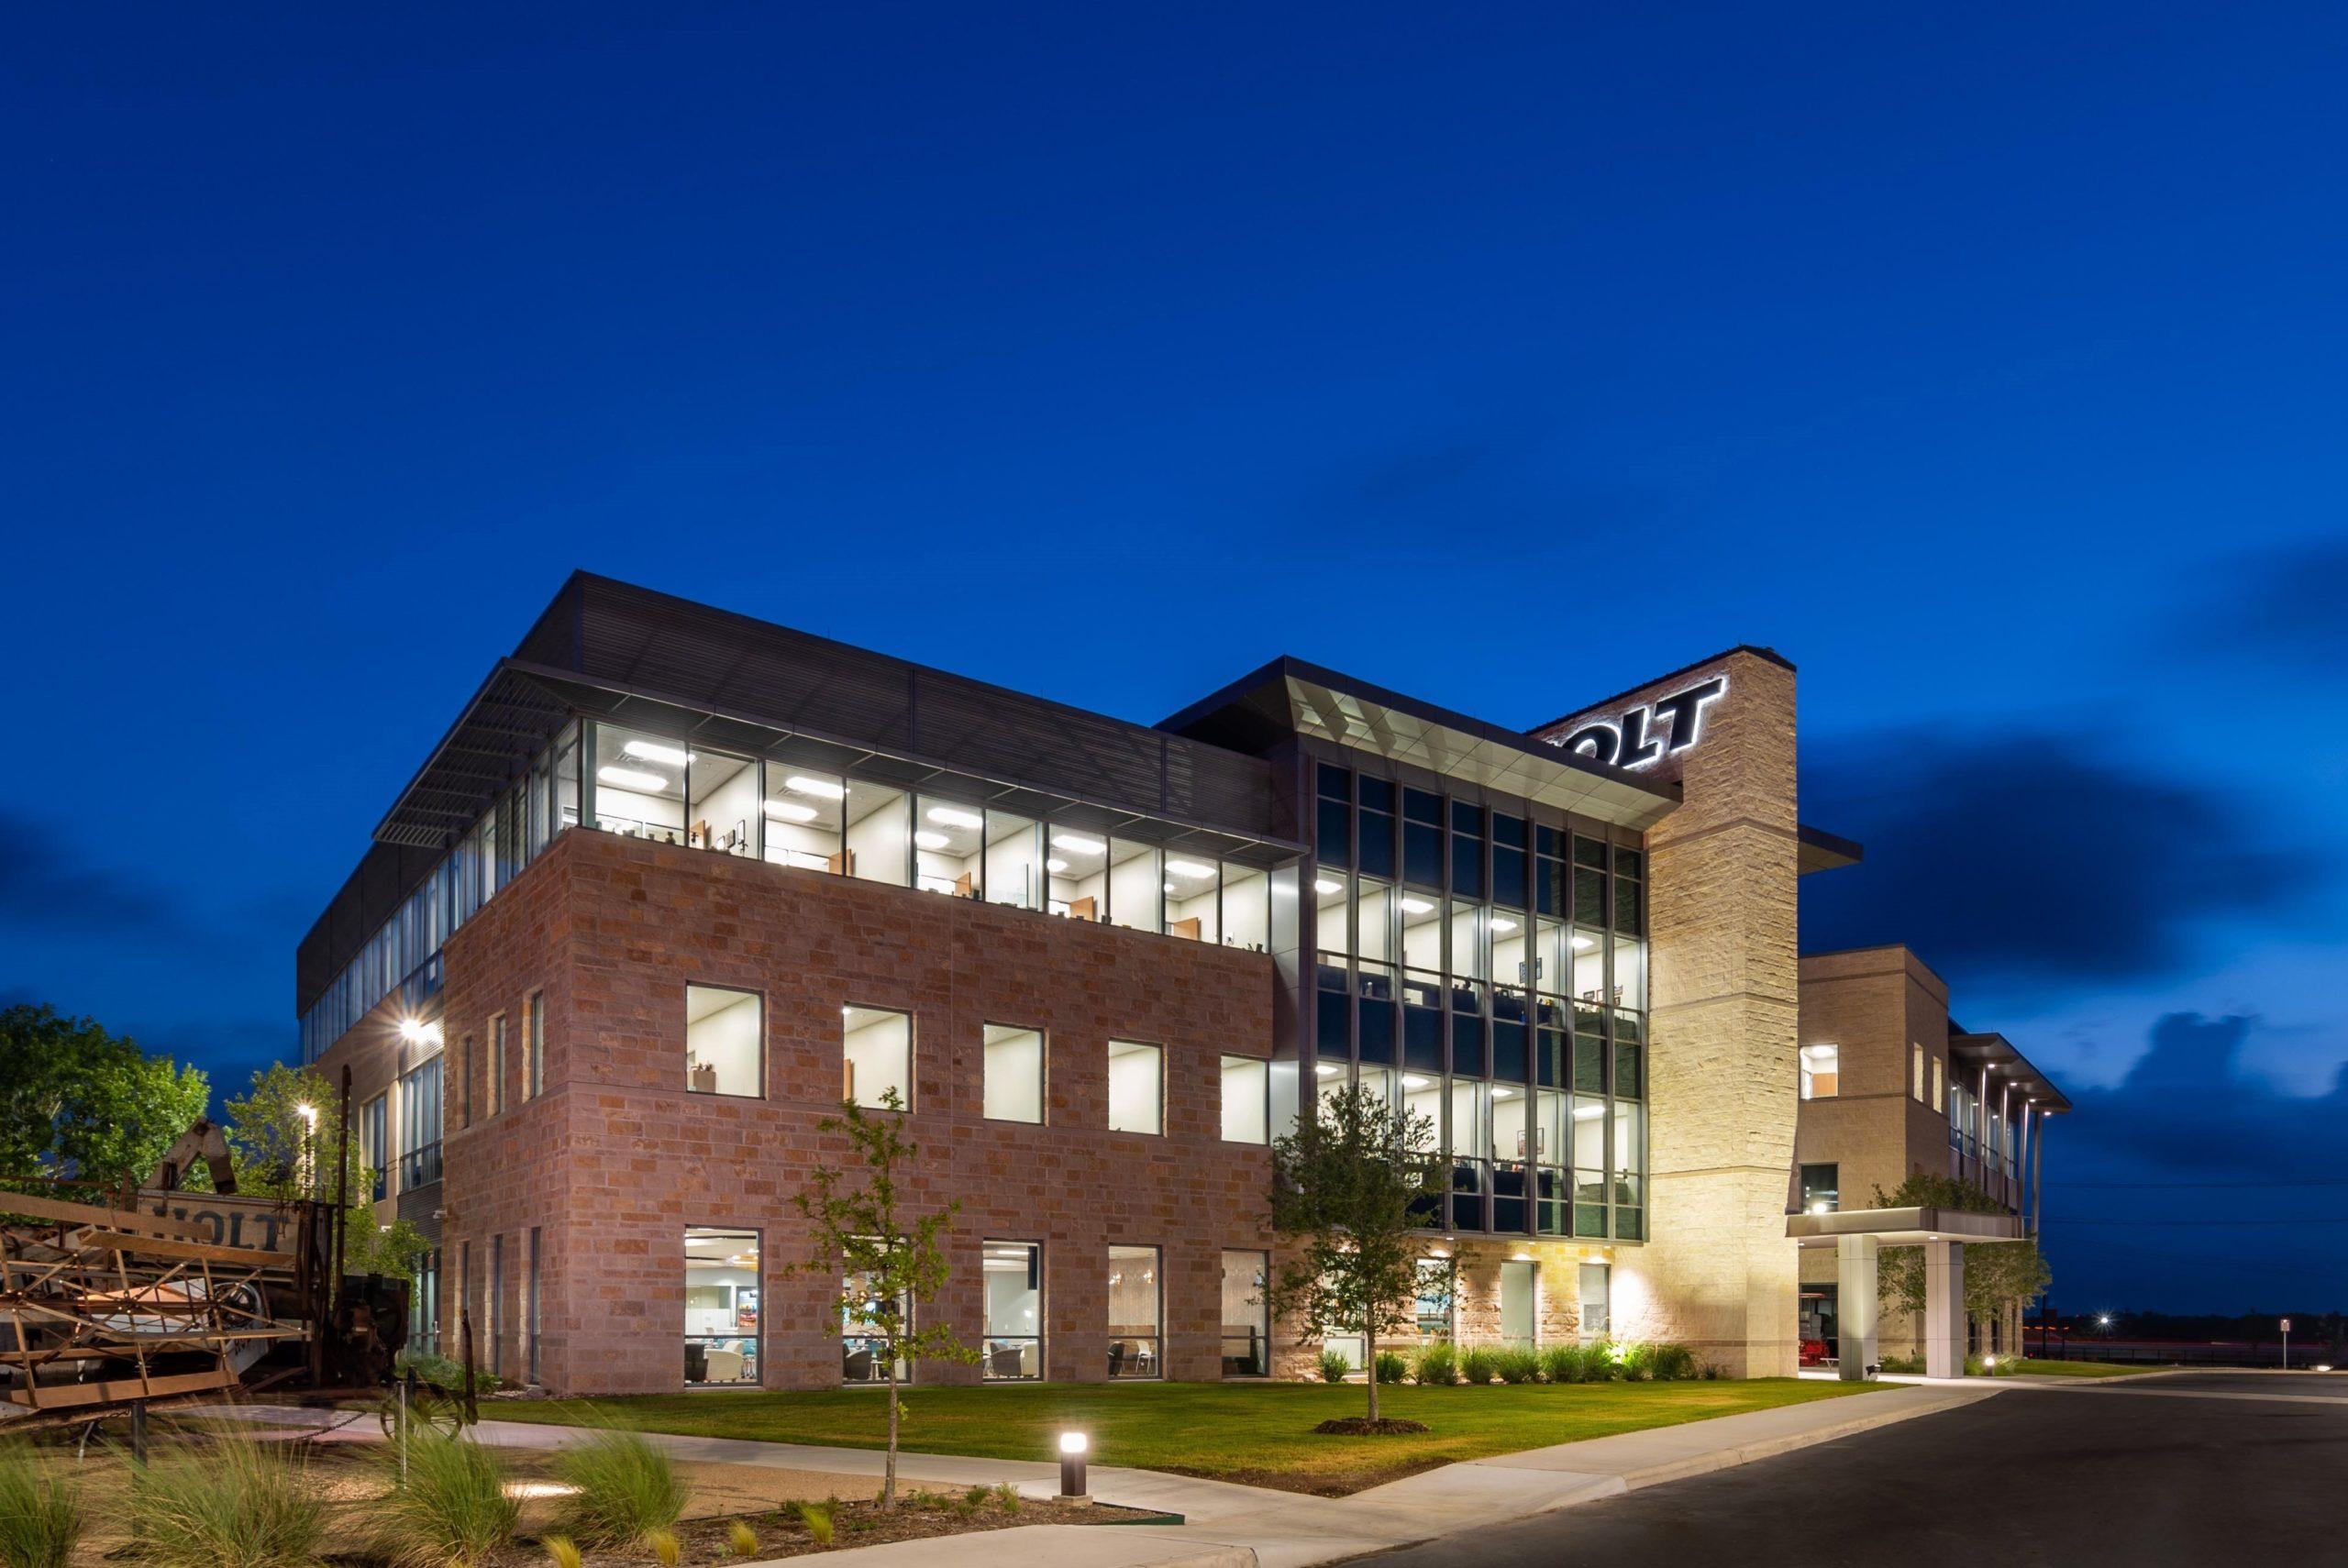 Holt Companies Corporate Headquarters